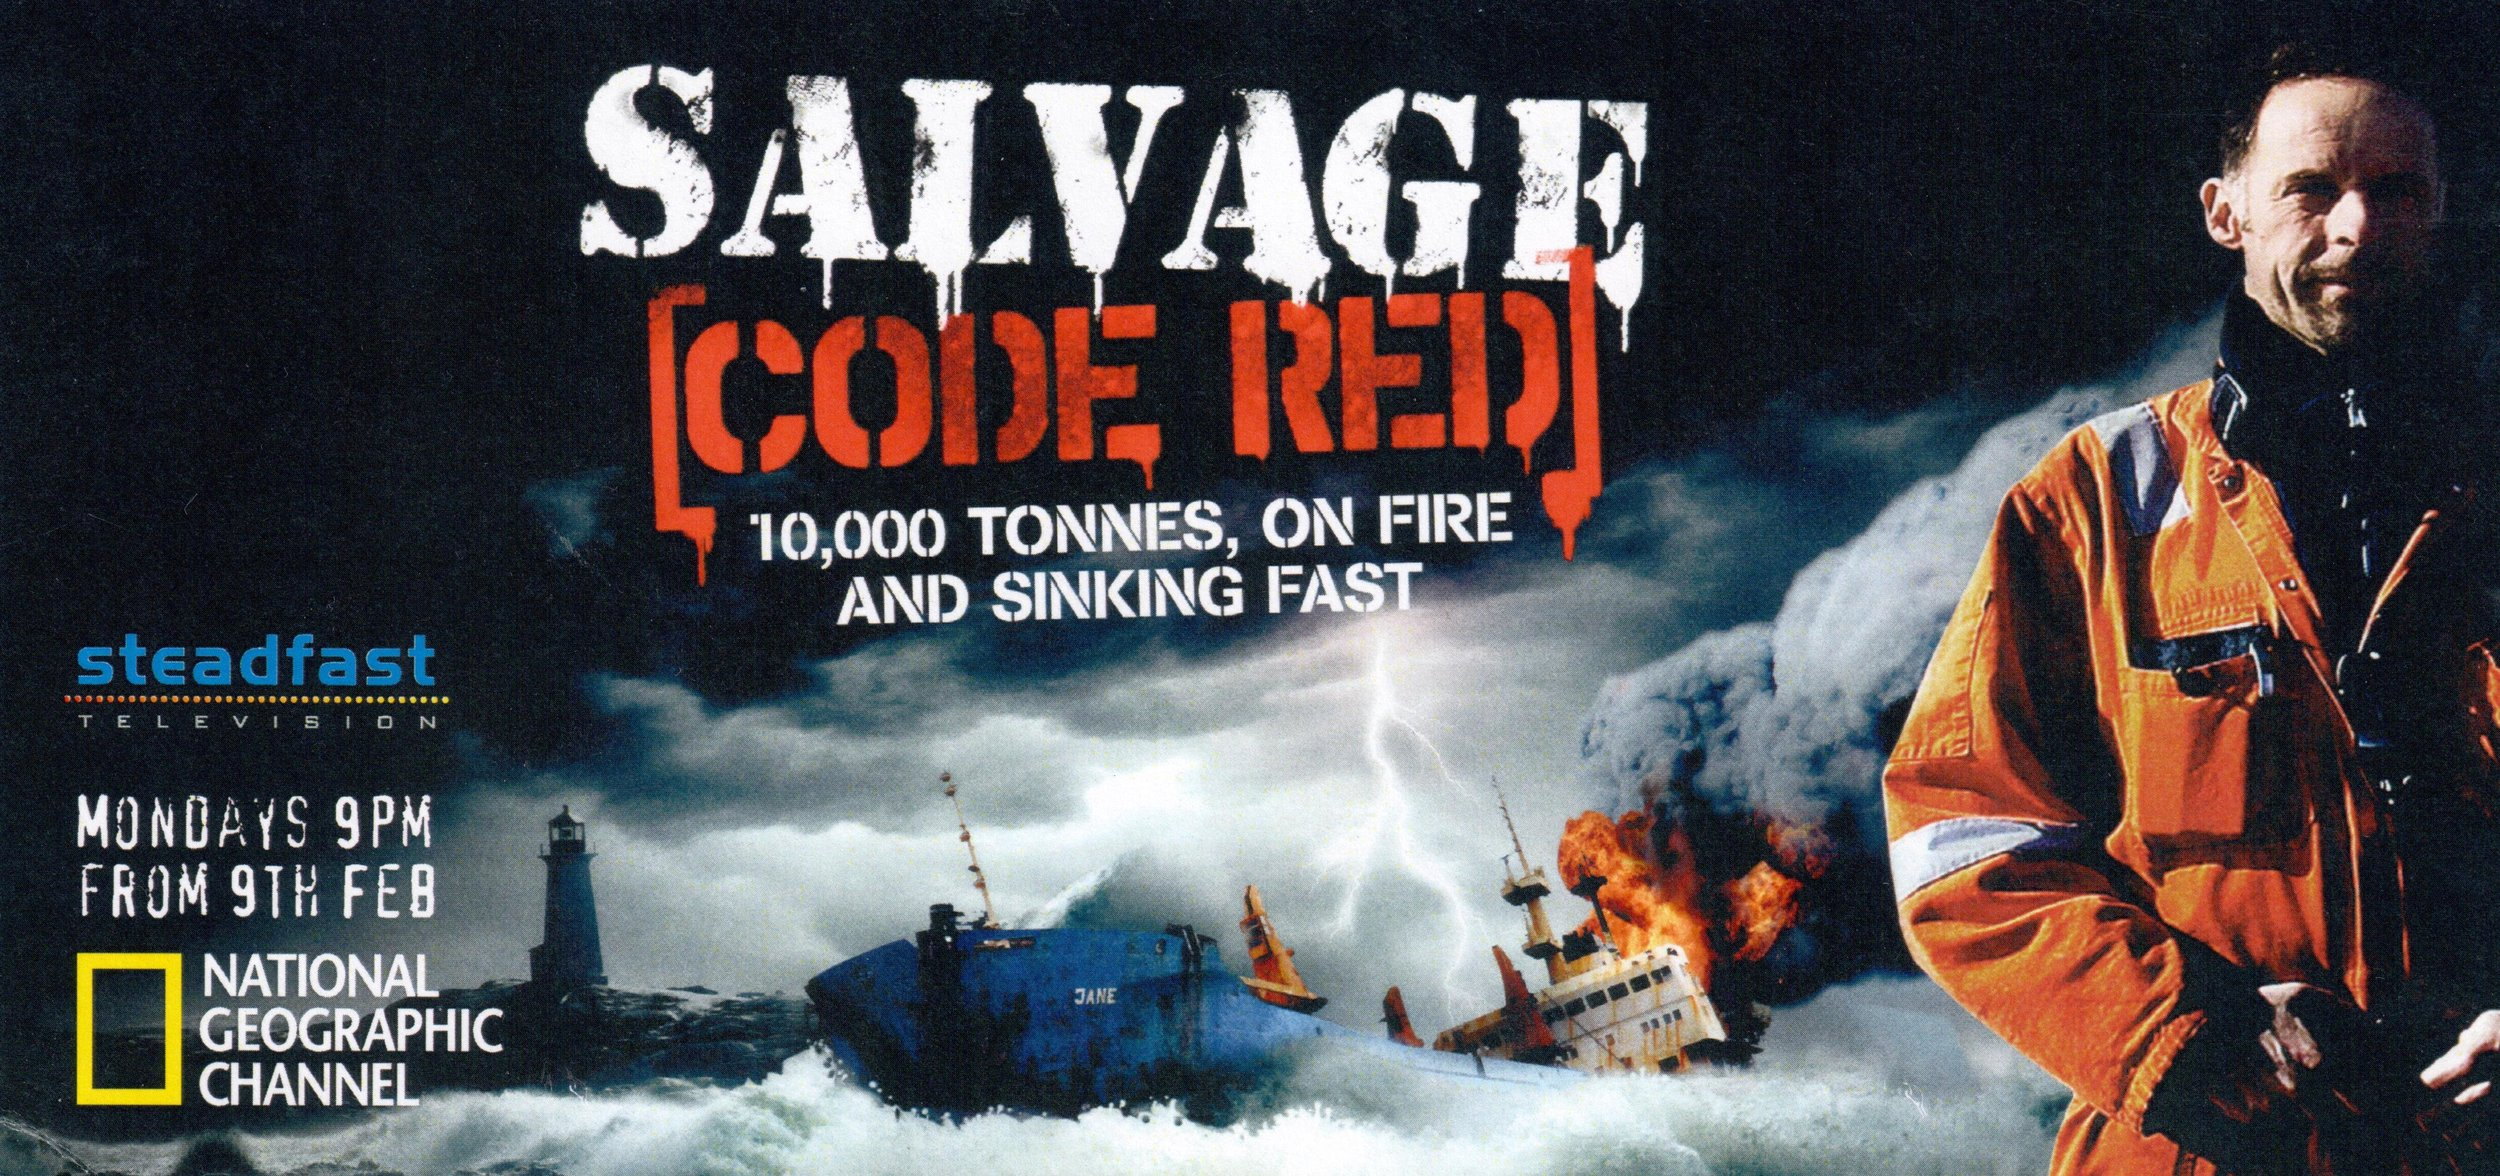 SALVAGE CODE RED scan copy.jpg